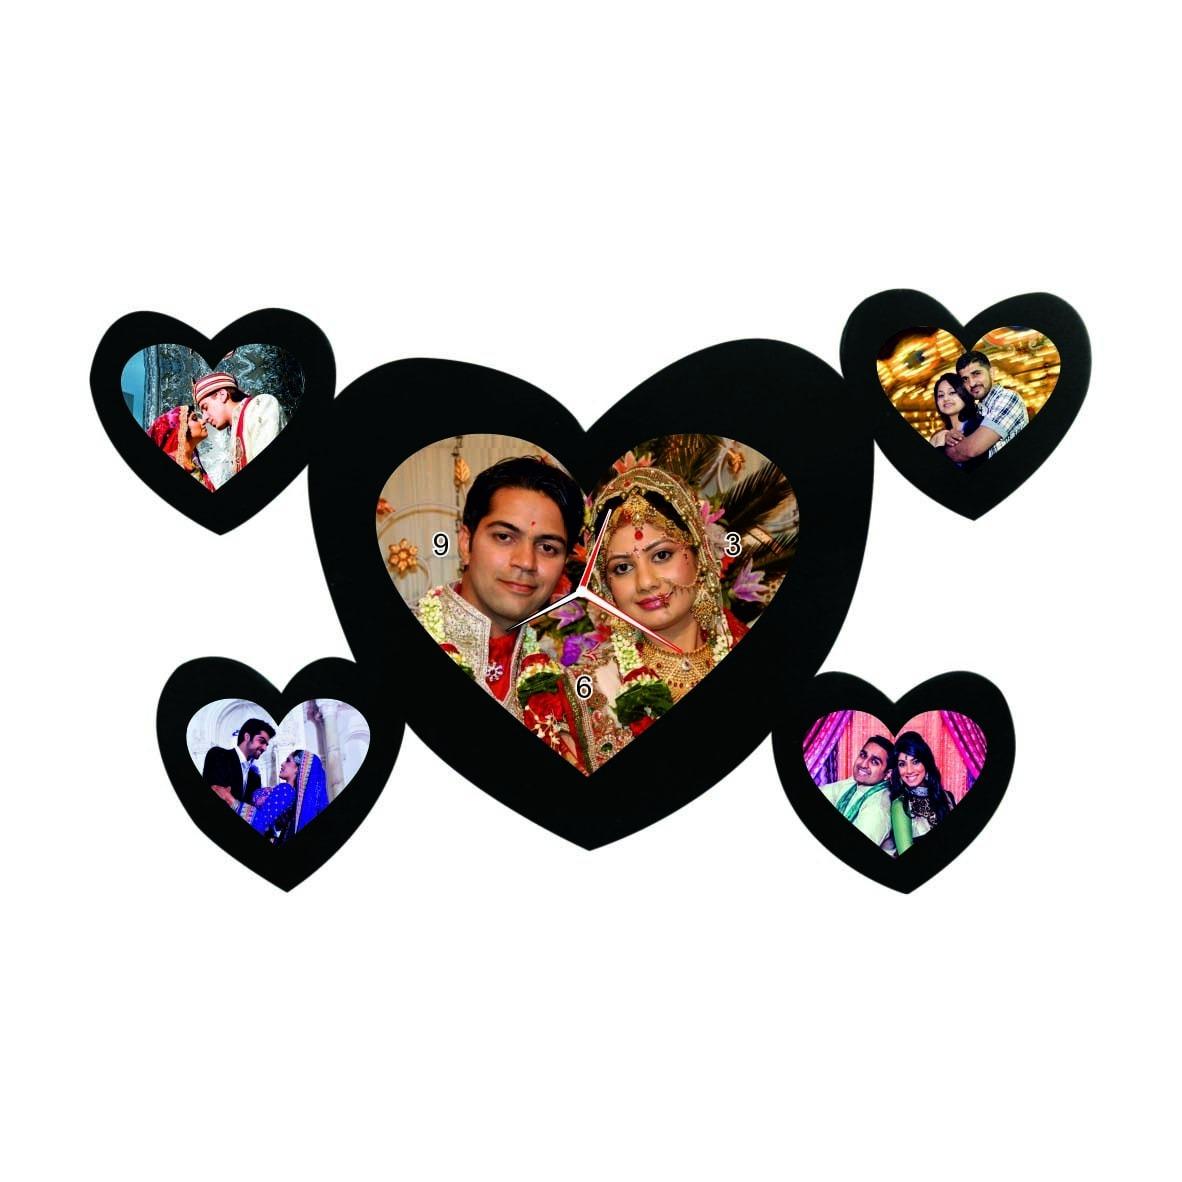 Heart shape photo frames